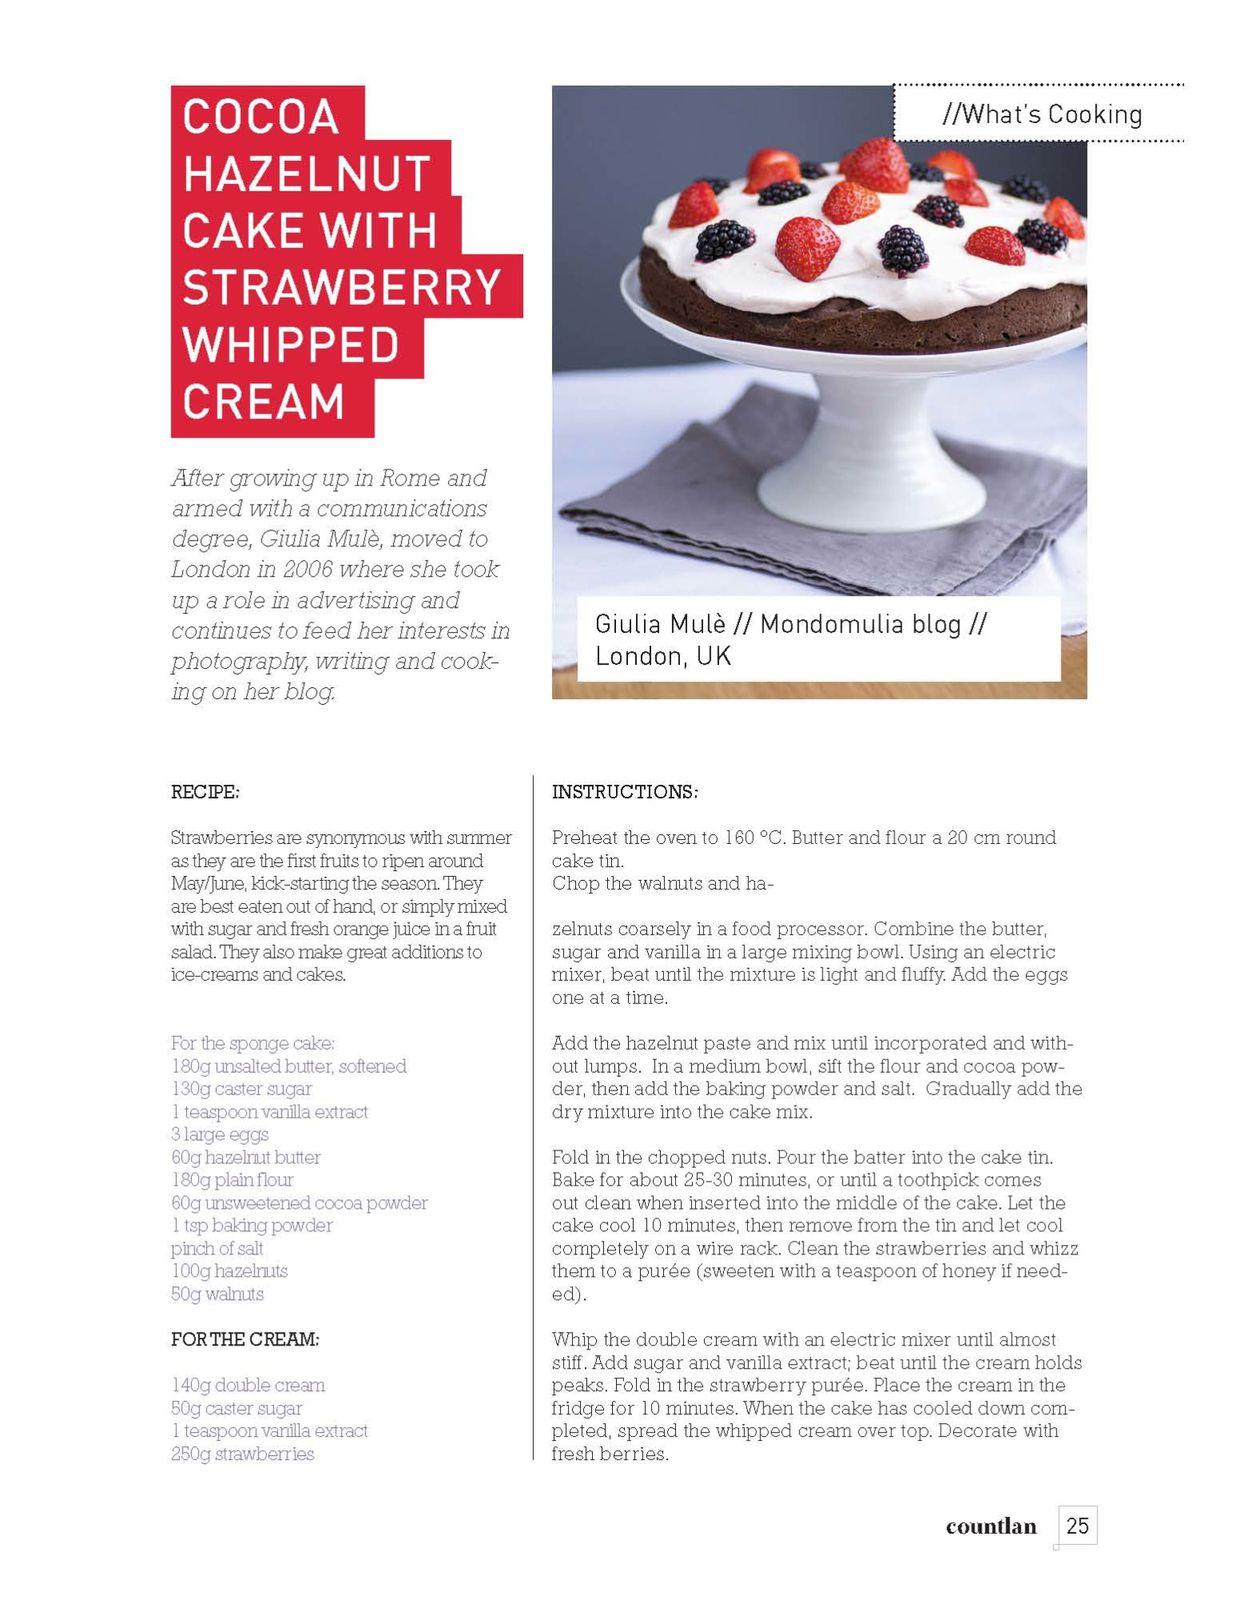 Cocoa Hazelnut Cake with Strawberry Cream